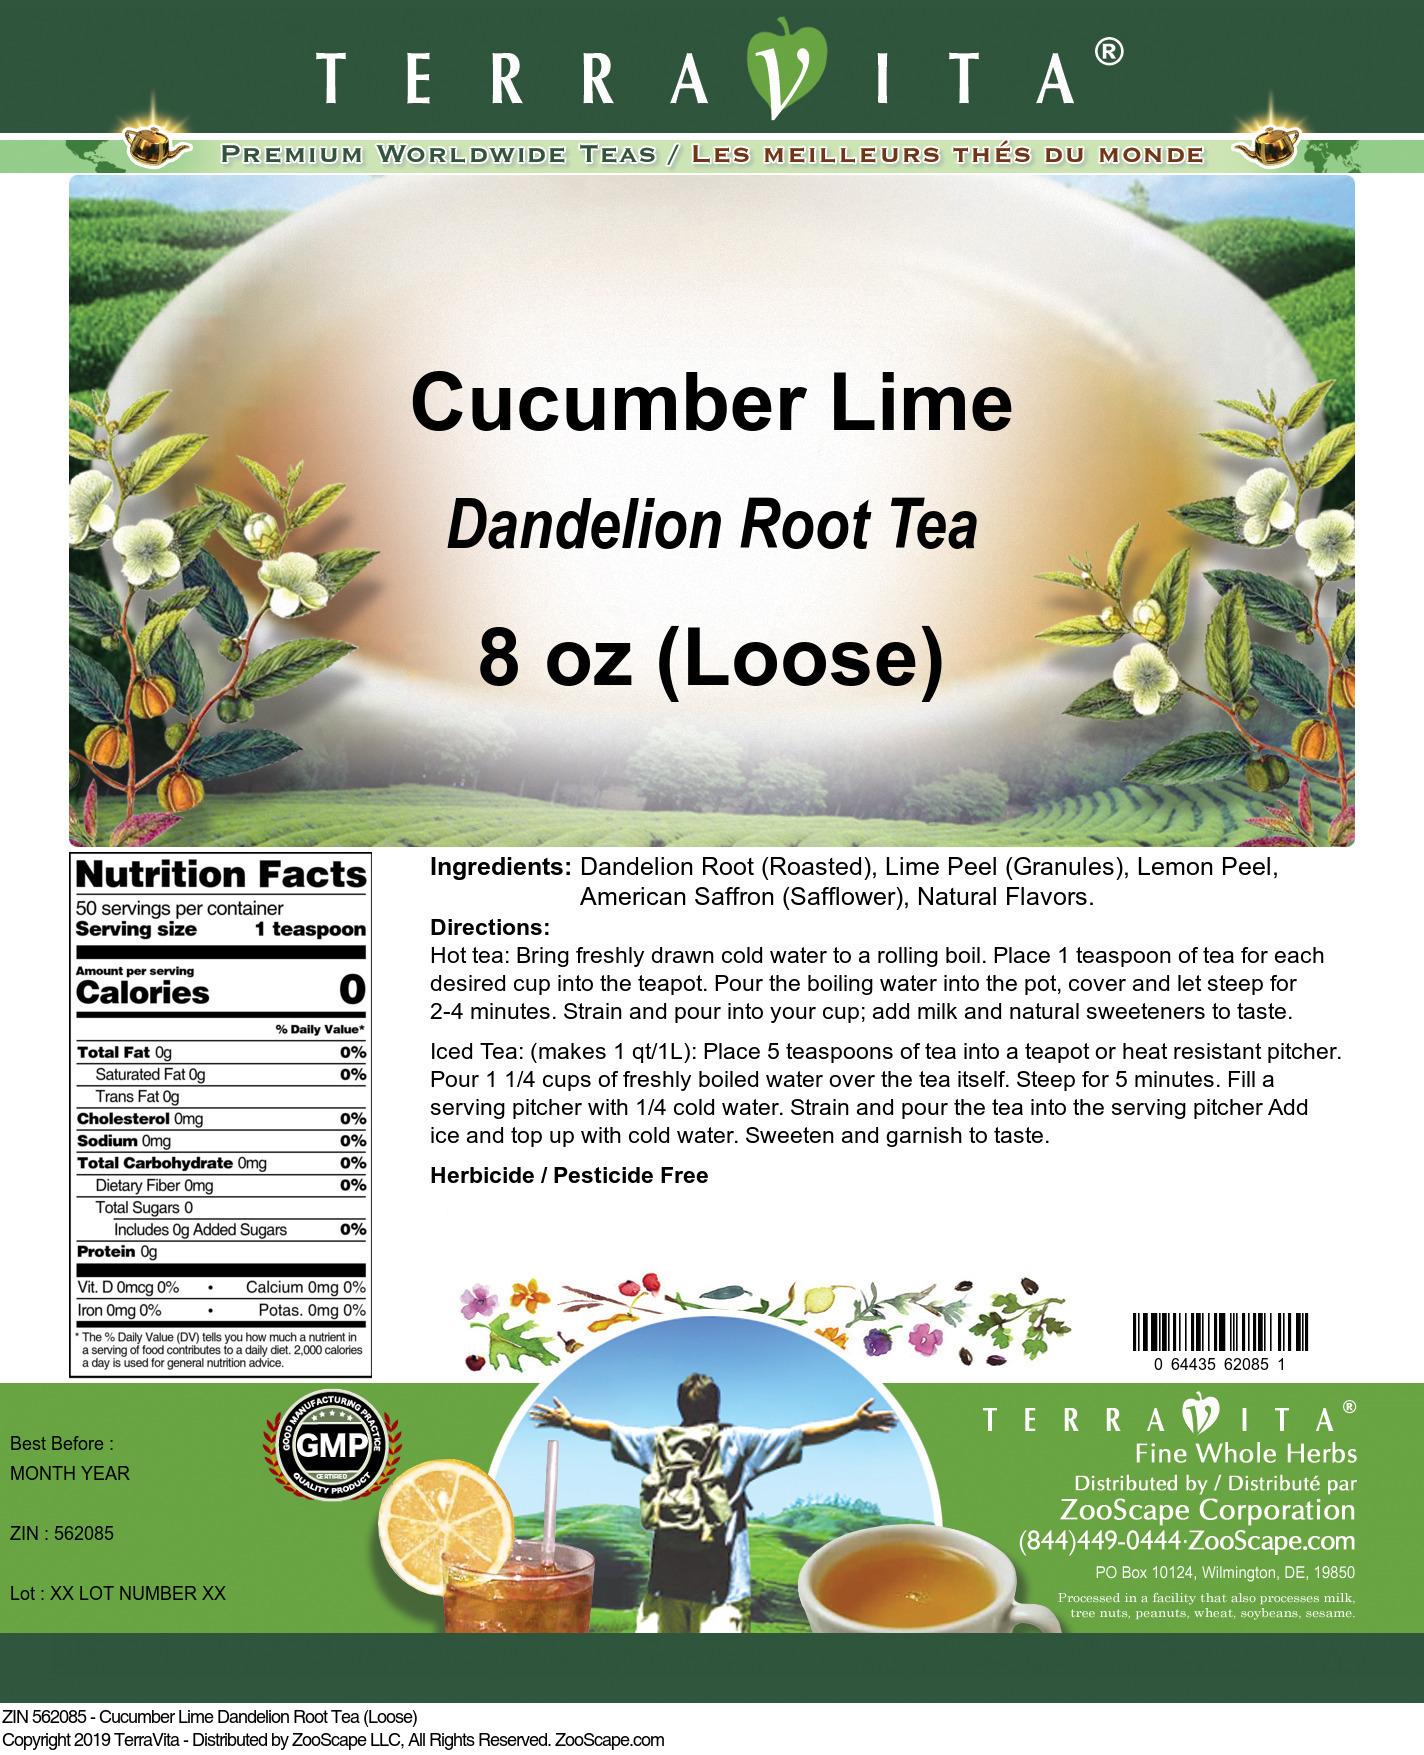 Cucumber Lime Dandelion Root